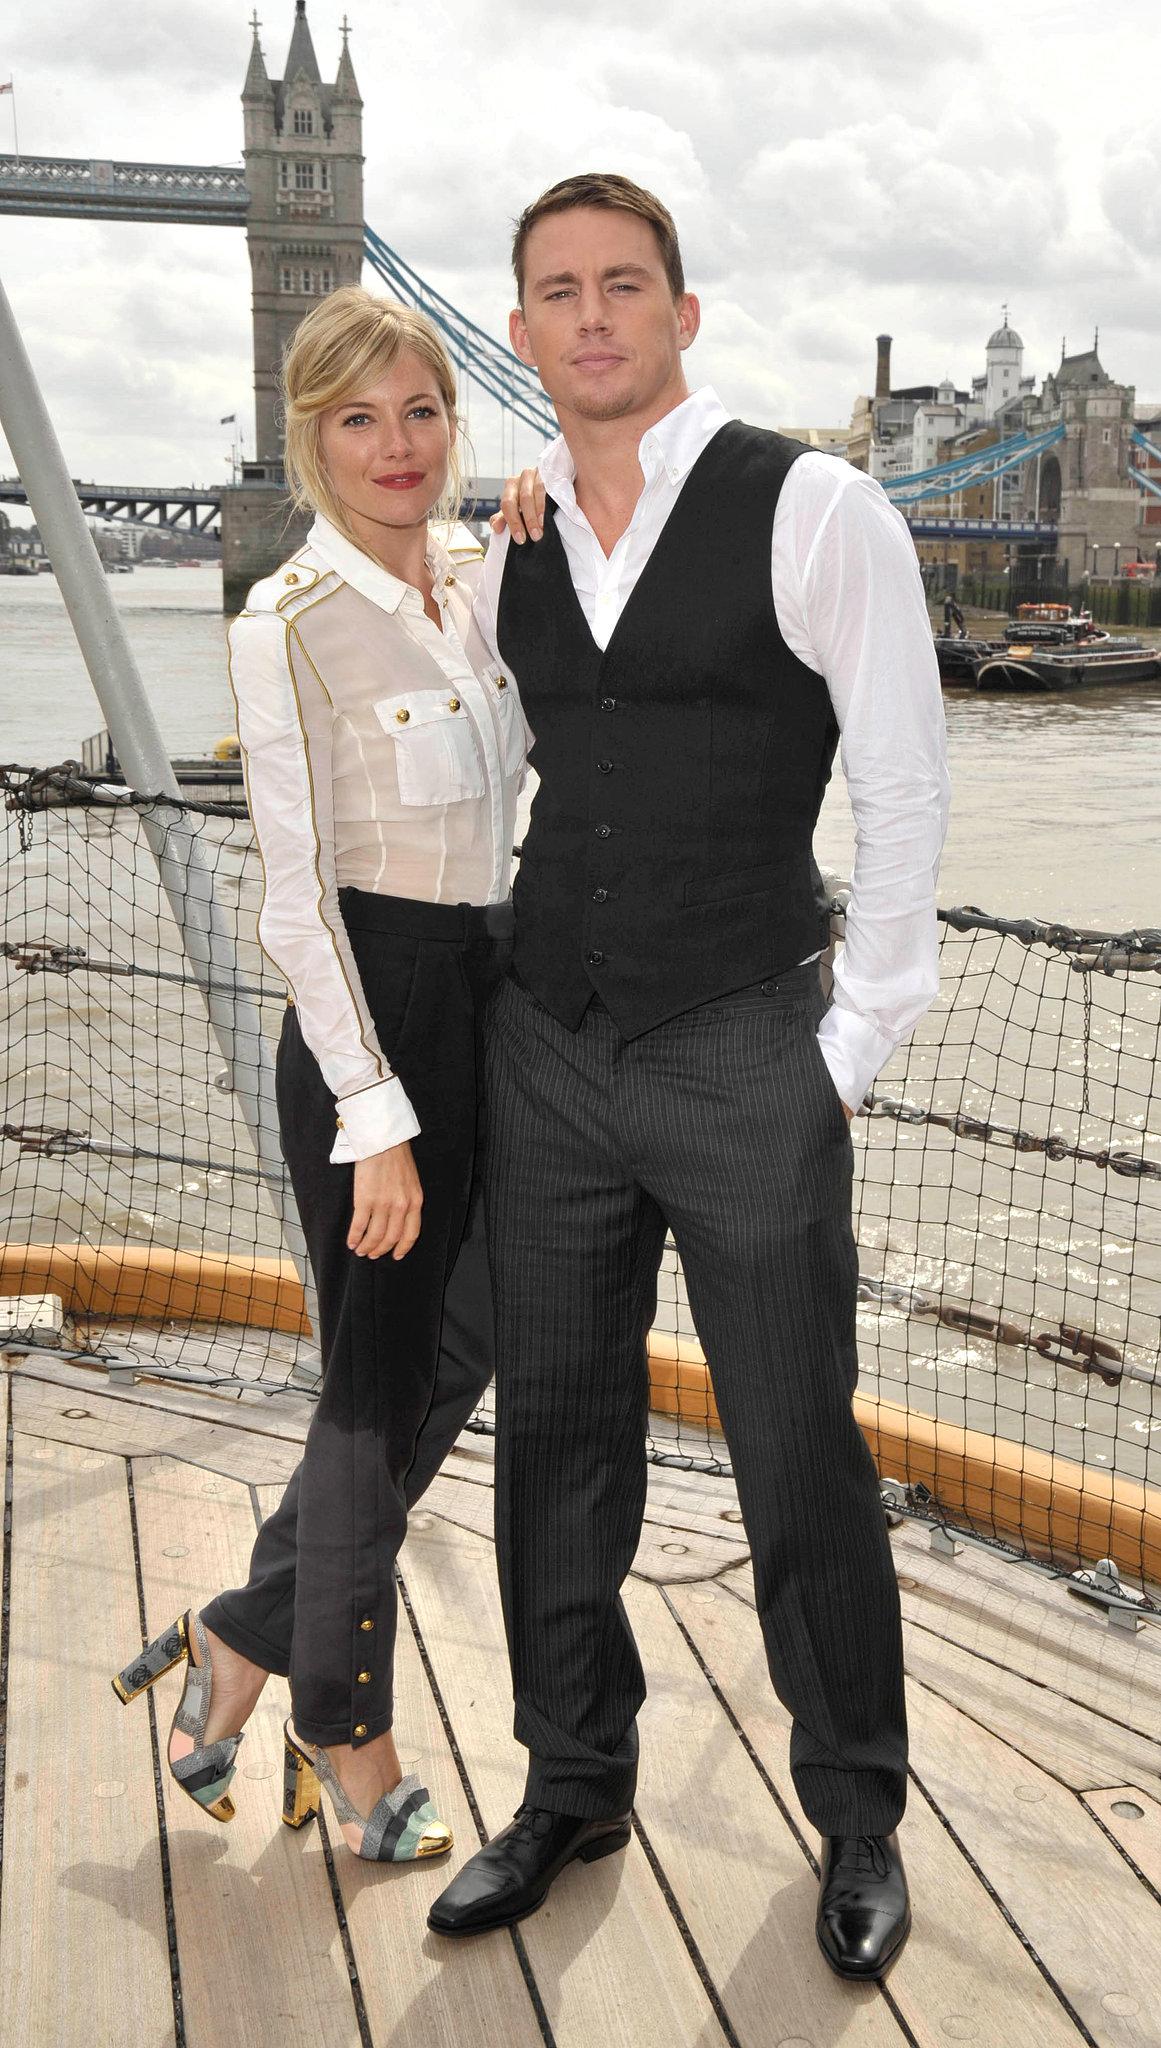 Sienna Miller and Channing Tatum